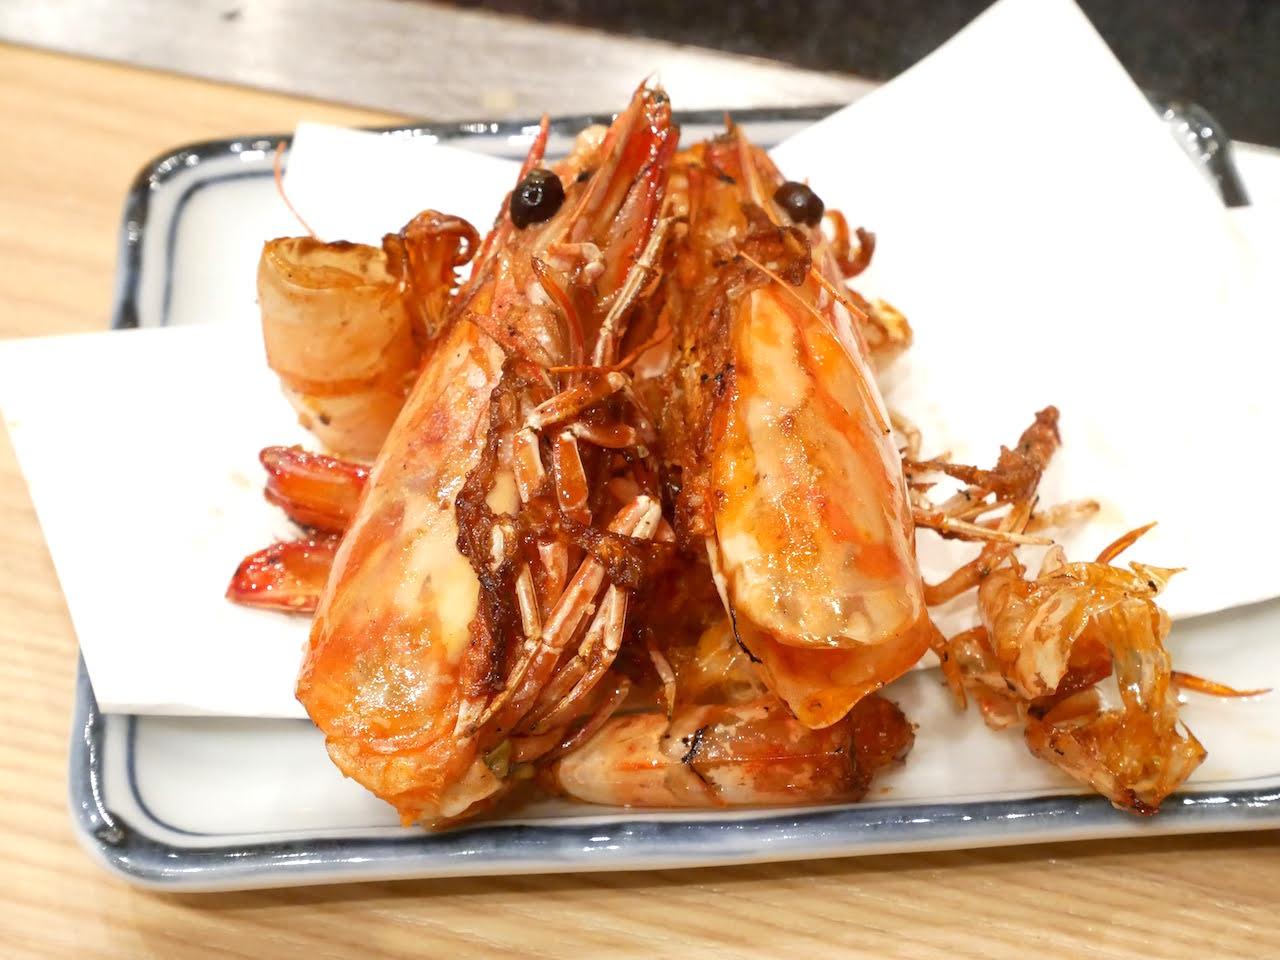 http://dinner.tokyo-review.com/images/1090520.jpg